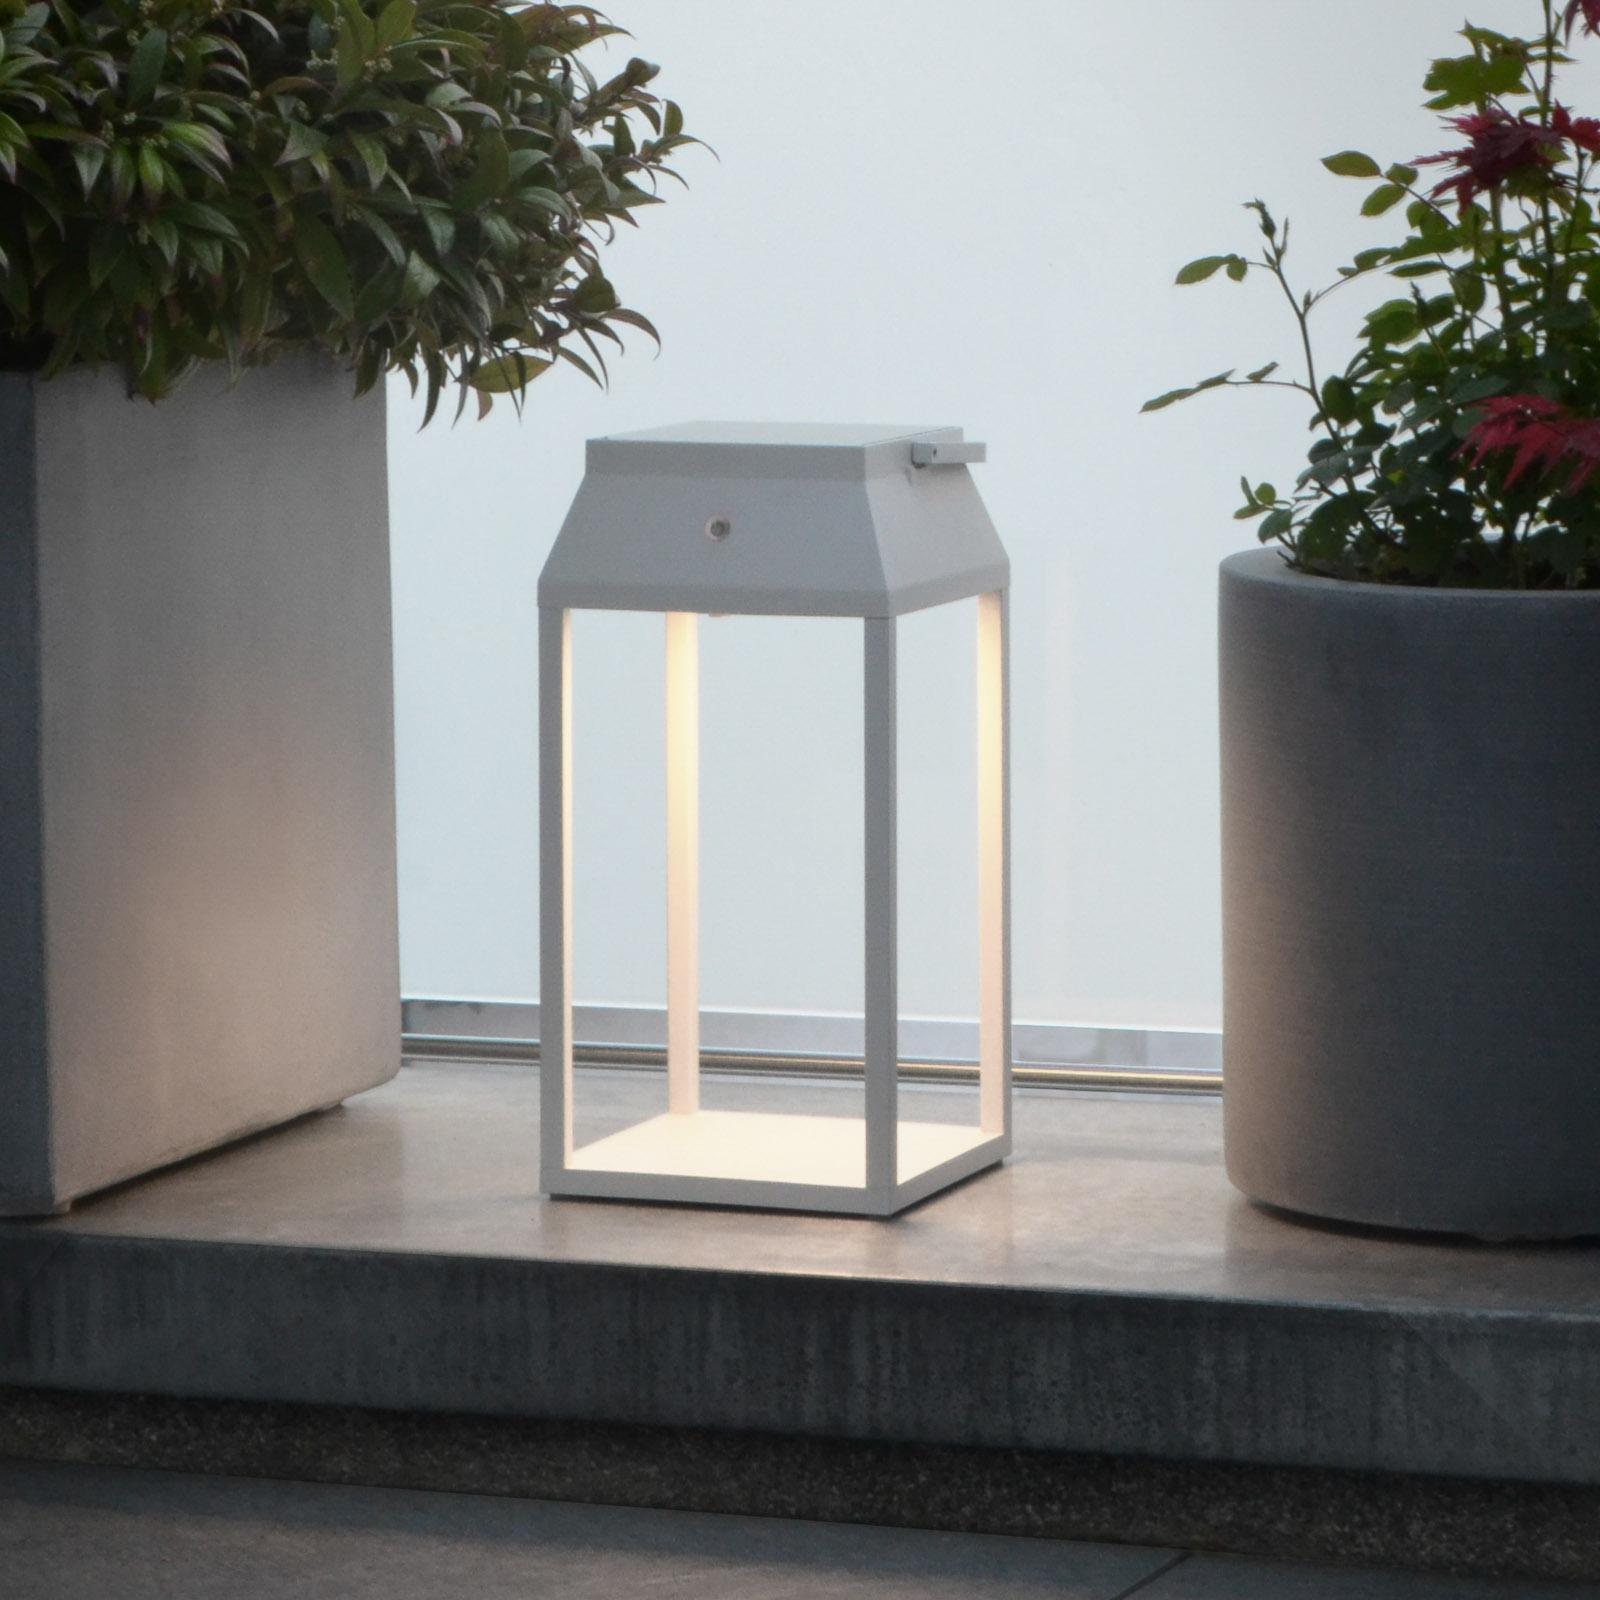 Latarnia solarna LED Louis, biała